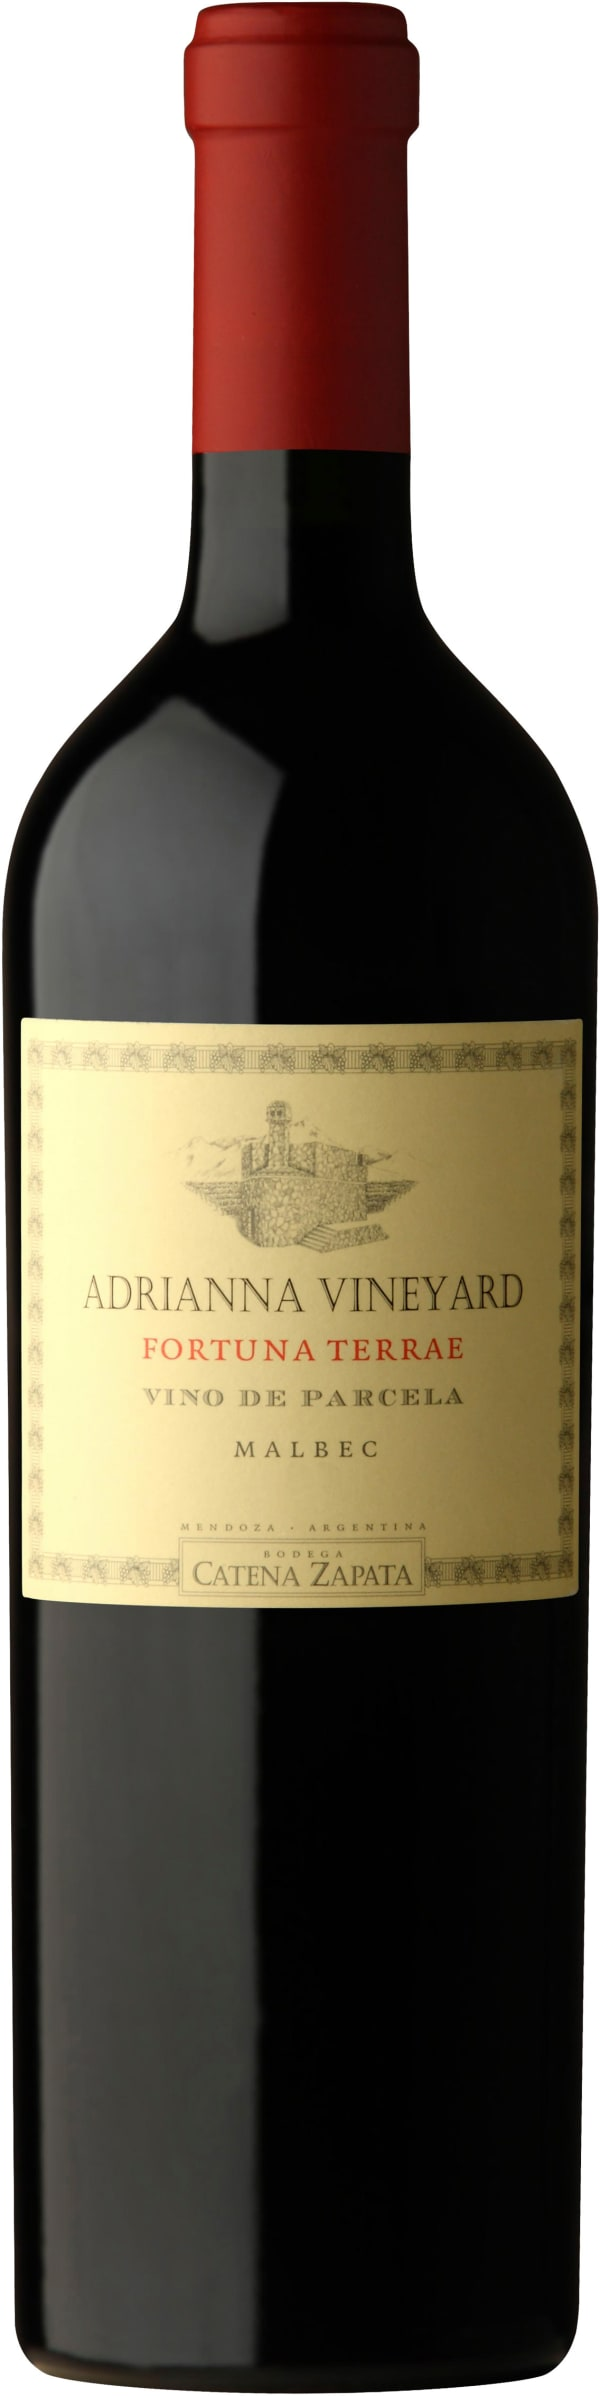 Adrianna Vineyard Fortuna Terrae Malbec 2015